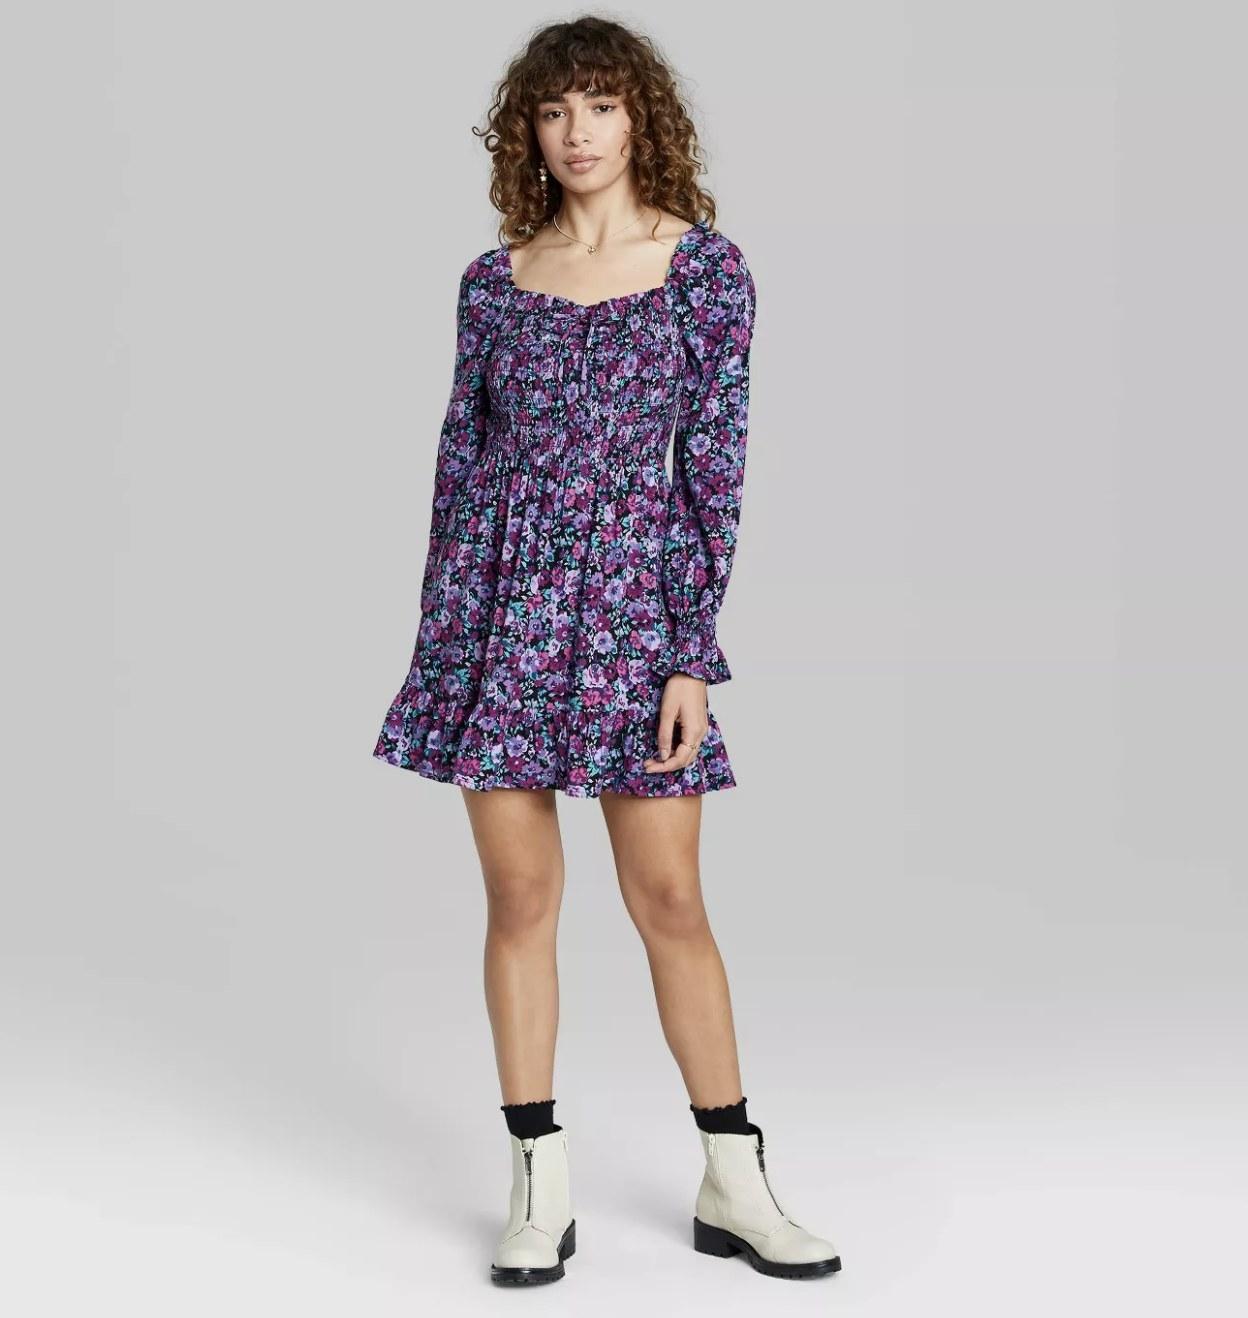 long-sleeve floral midi dress in purple